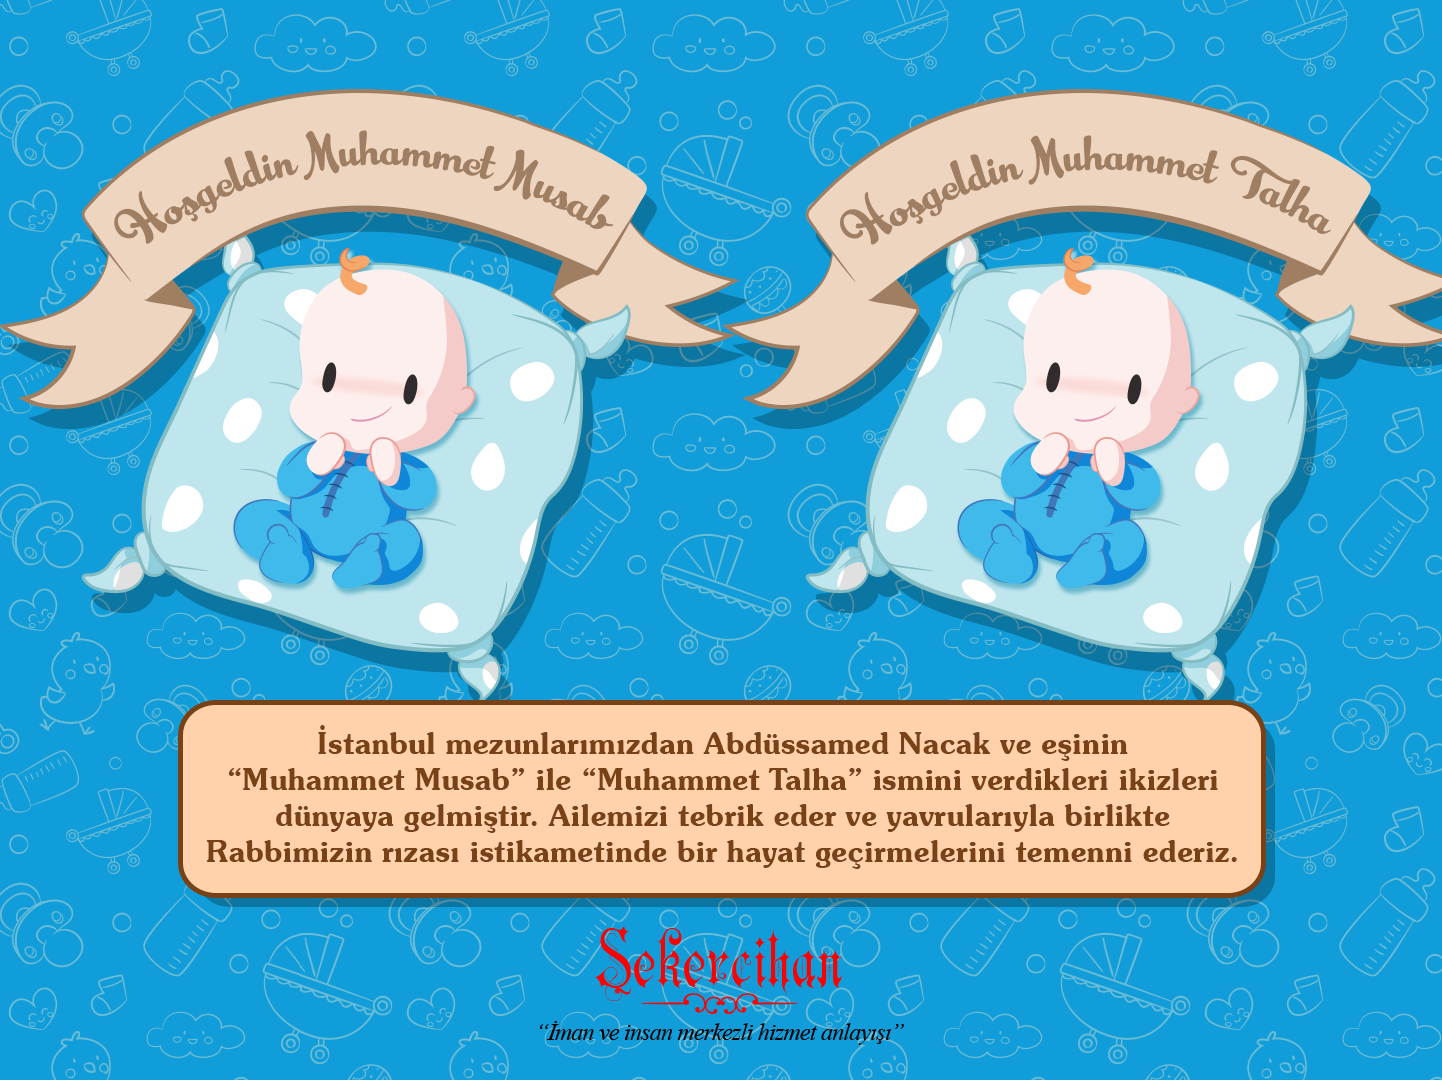 Hoşgeldin Muhammet Musab ve Muhammet Talha